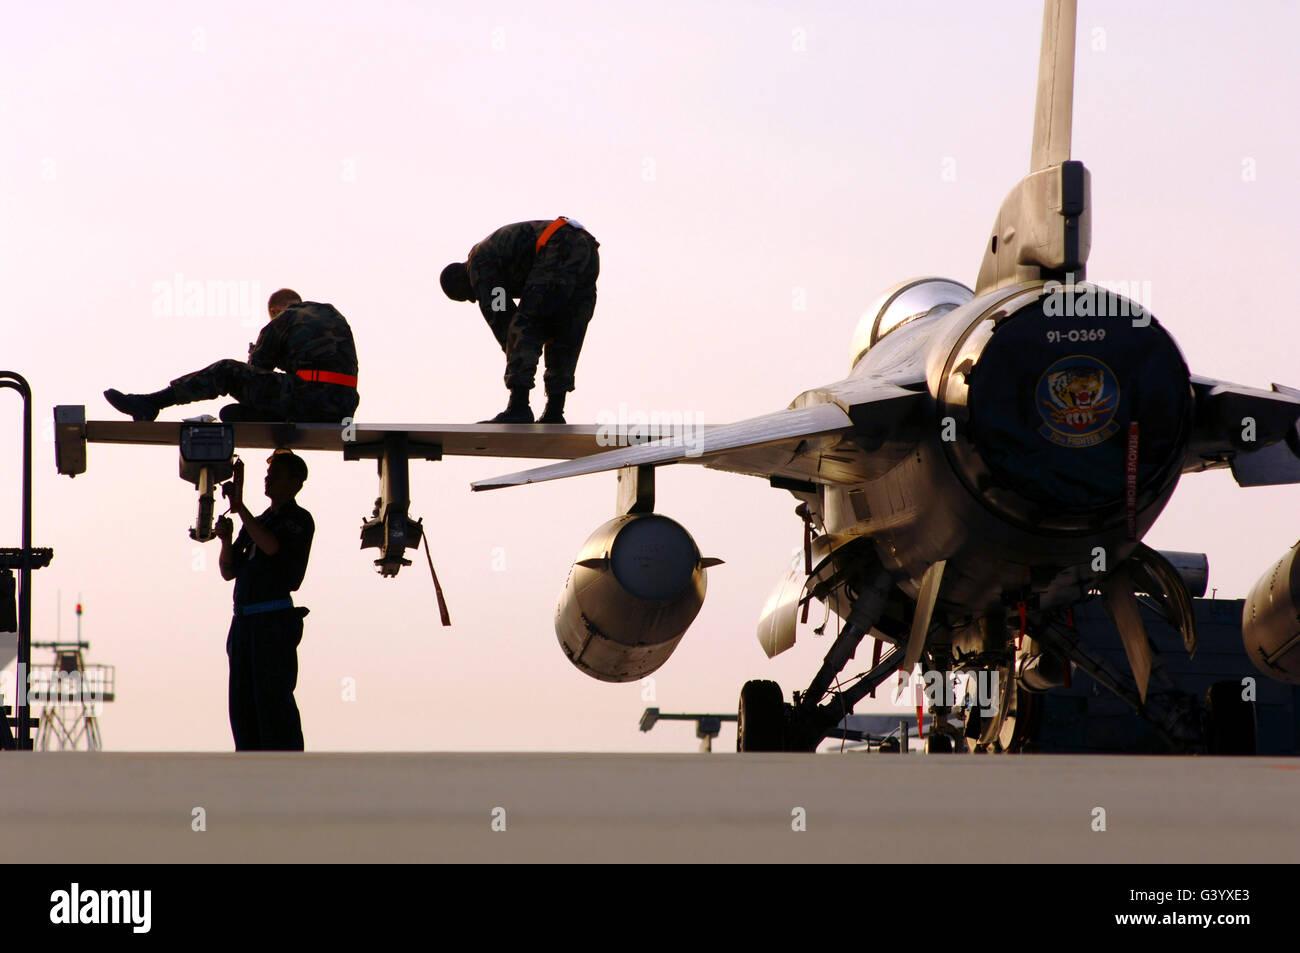 rew chiefs prepare an F-16 Fighting Falcon for take-off. - Stock Image